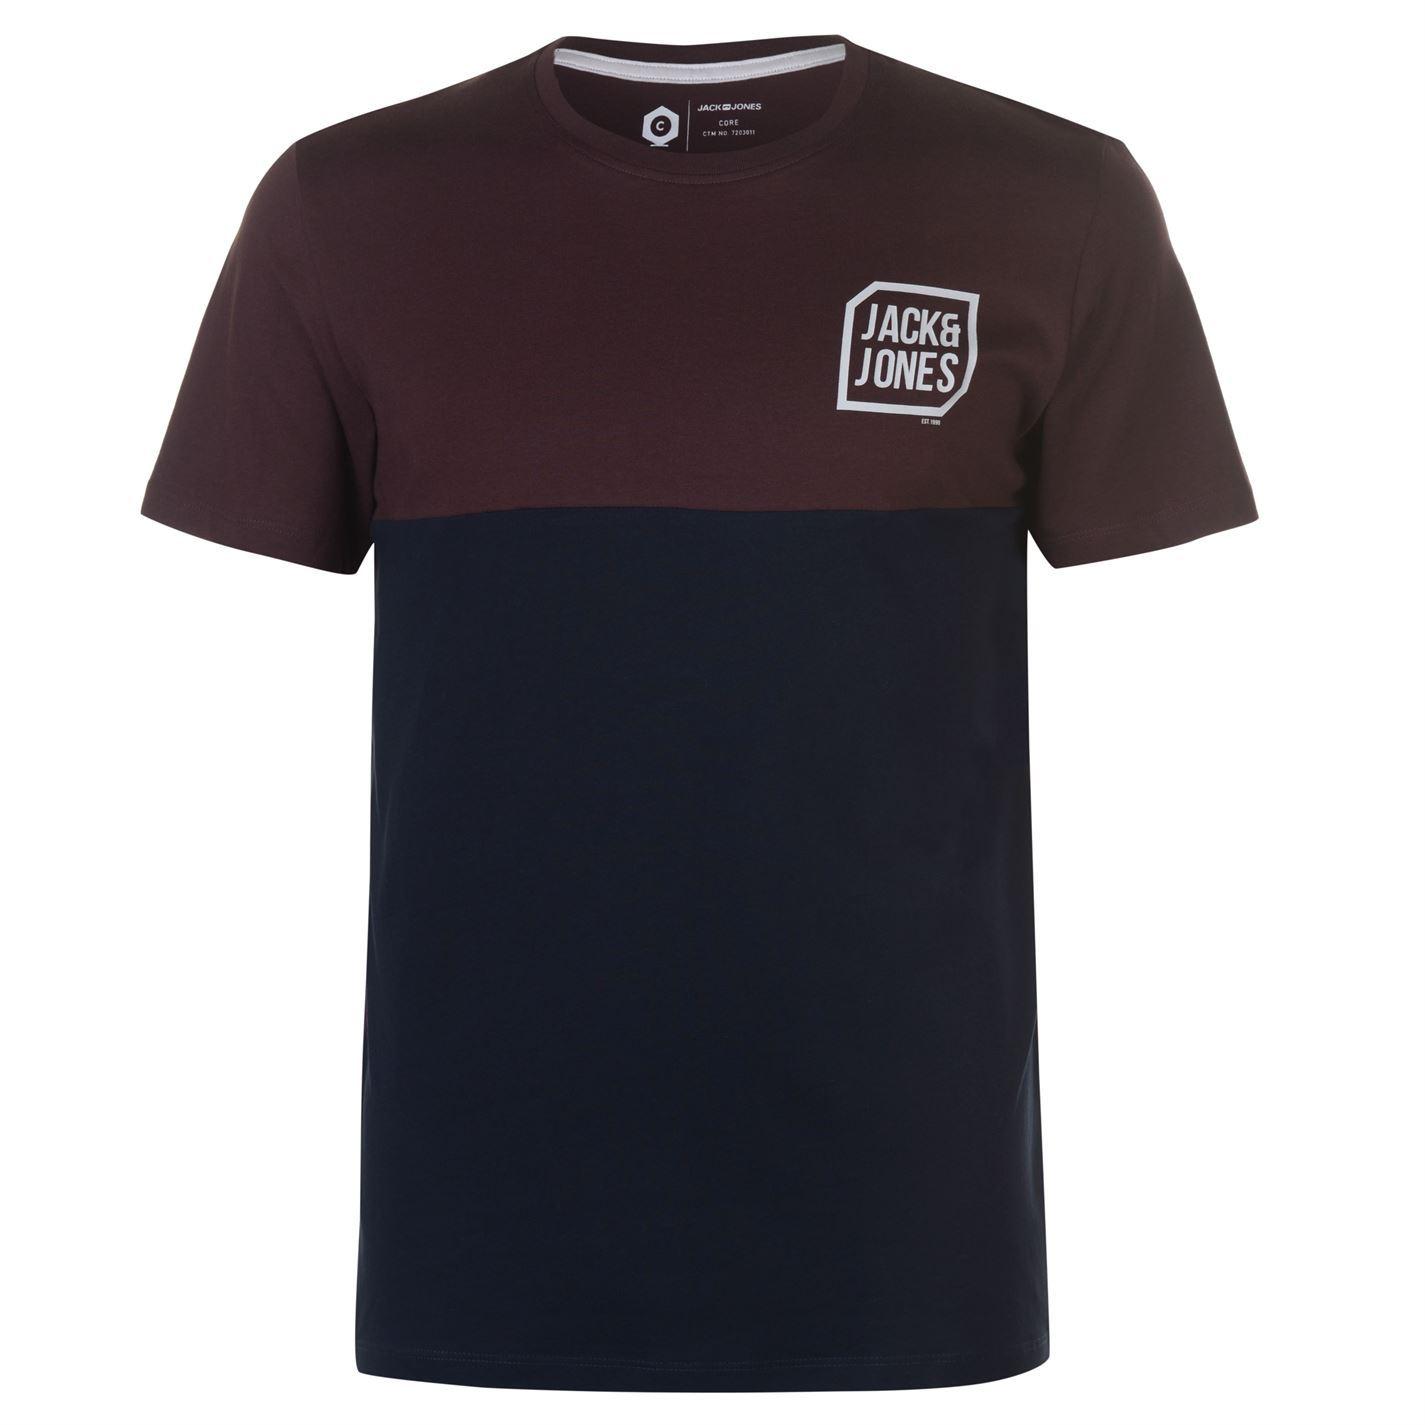 Jack-and-Jones-Core-Tern-T-Shirt-Mens-Tee-Shirt-Top thumbnail 11